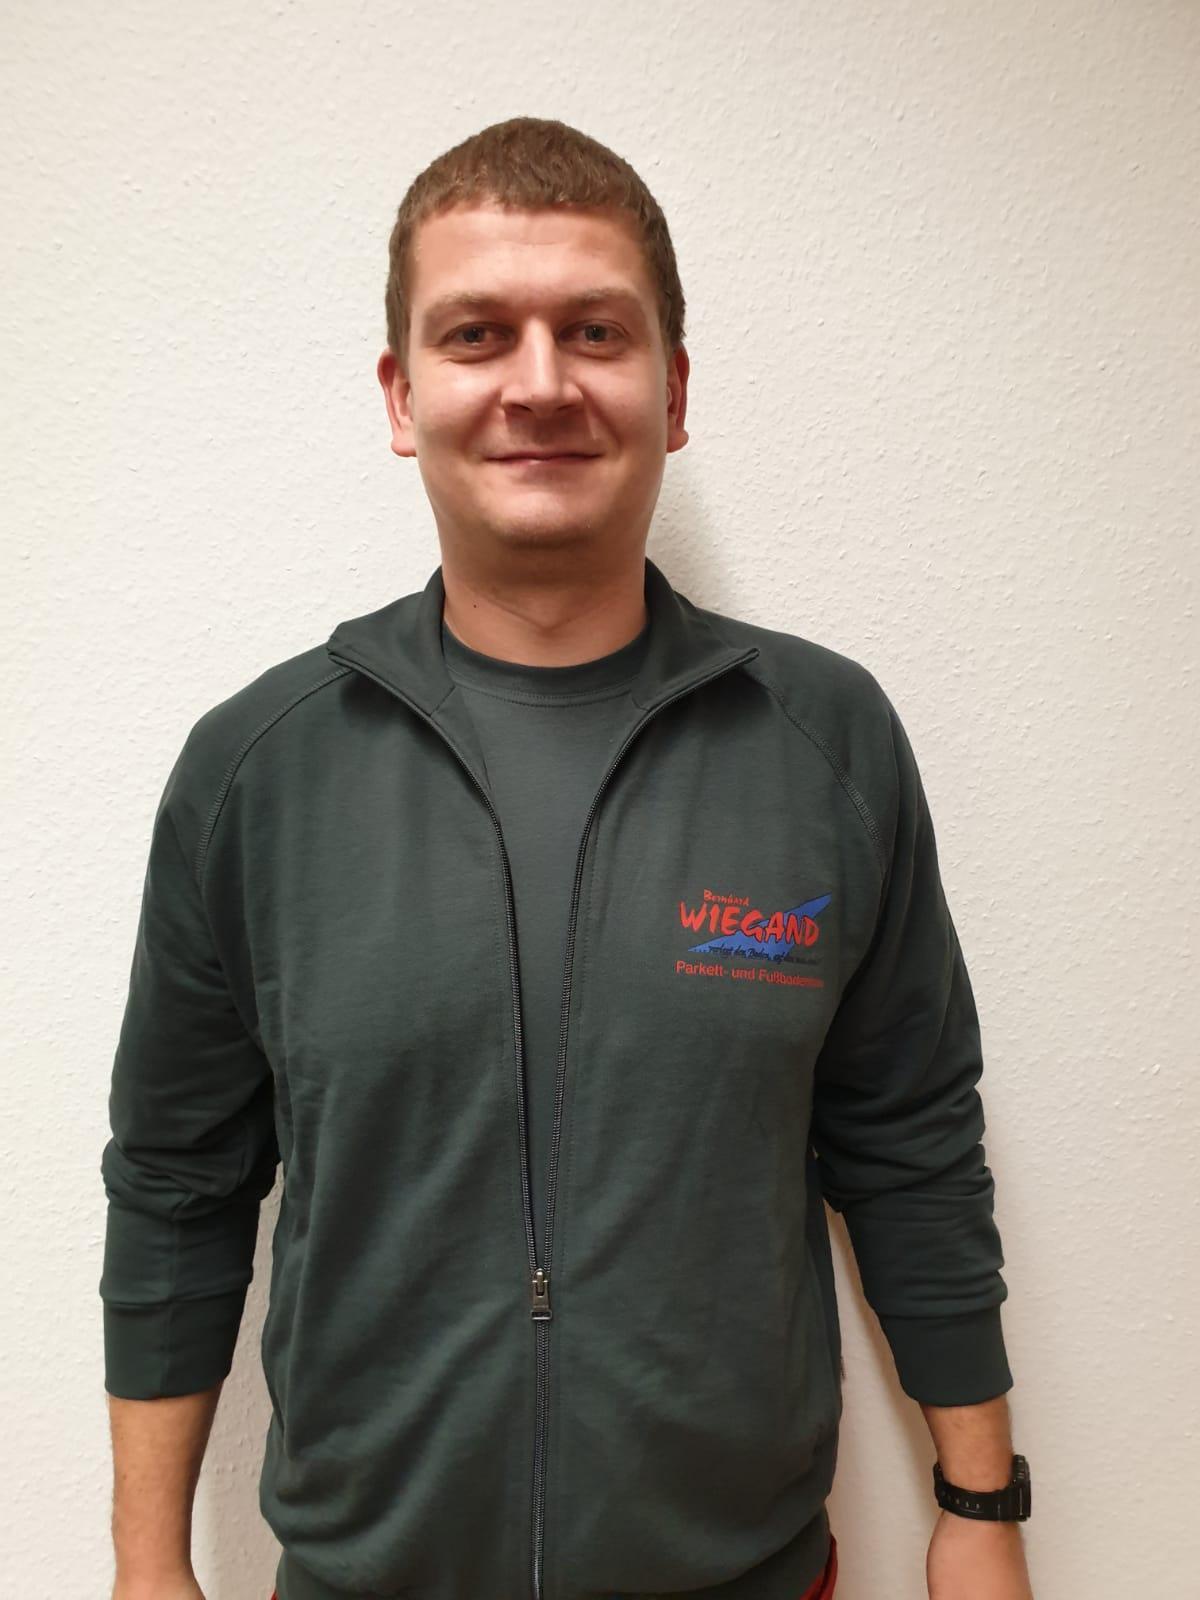 Christoph Altmann